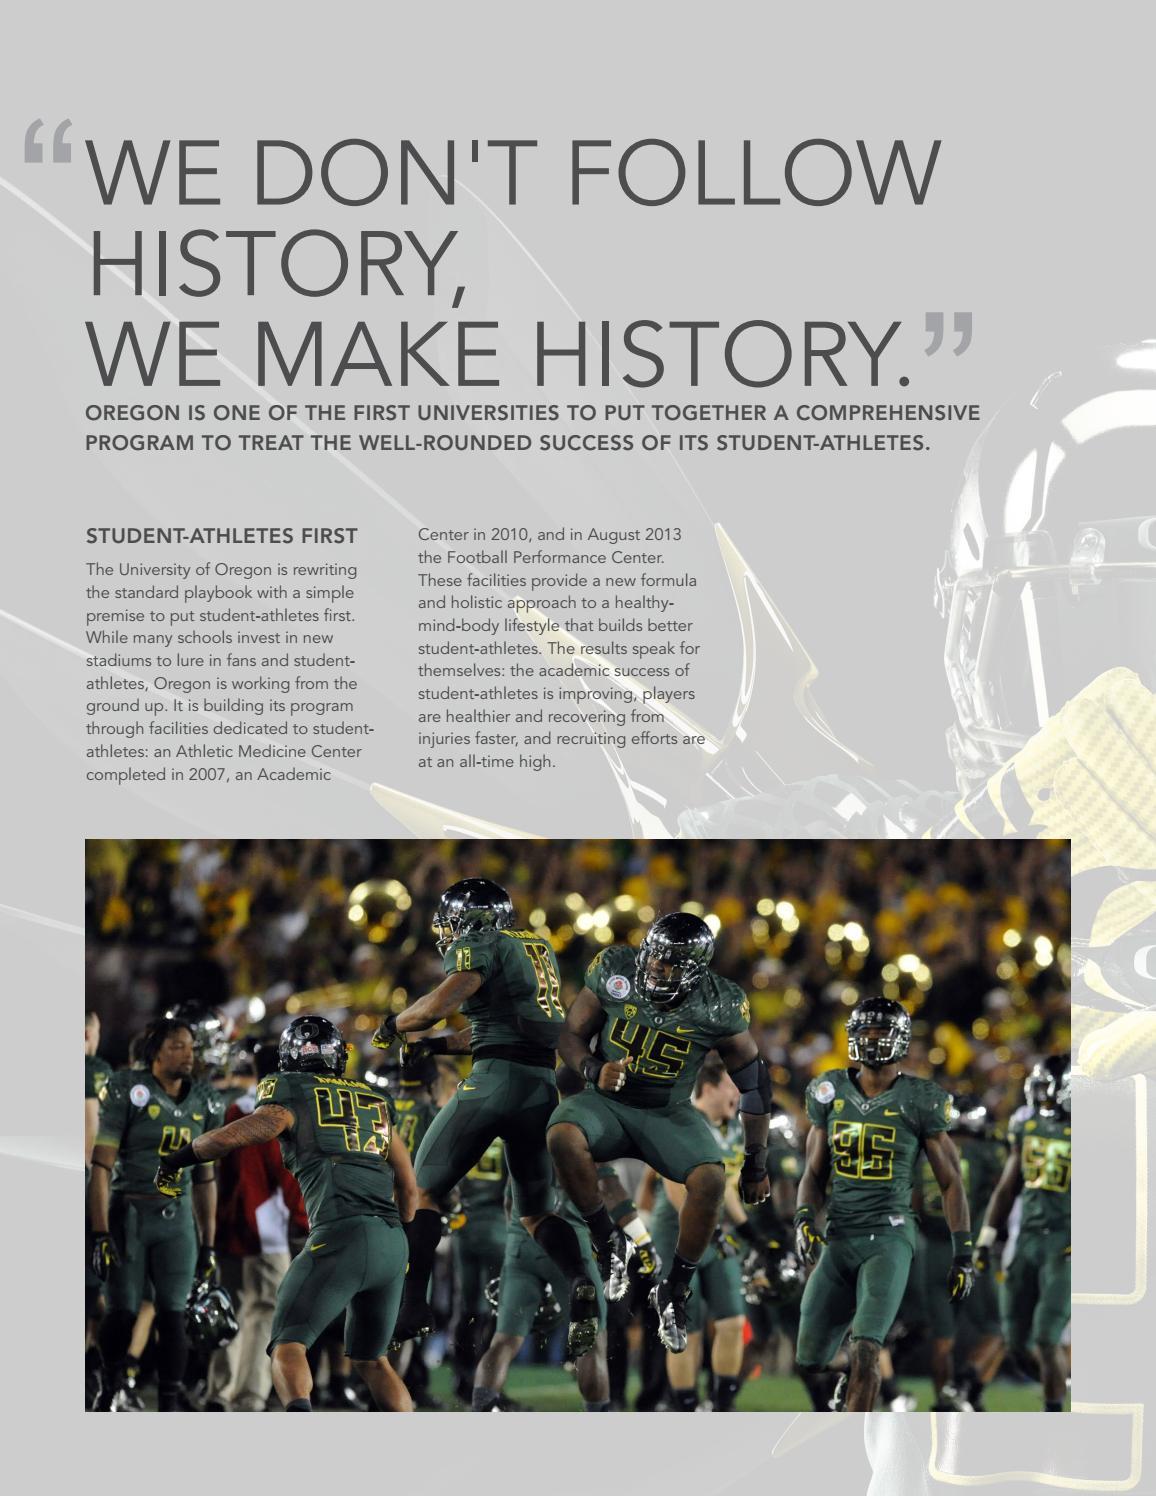 University of Oregon, Hatfield-Dowlin Complex, Football Performance